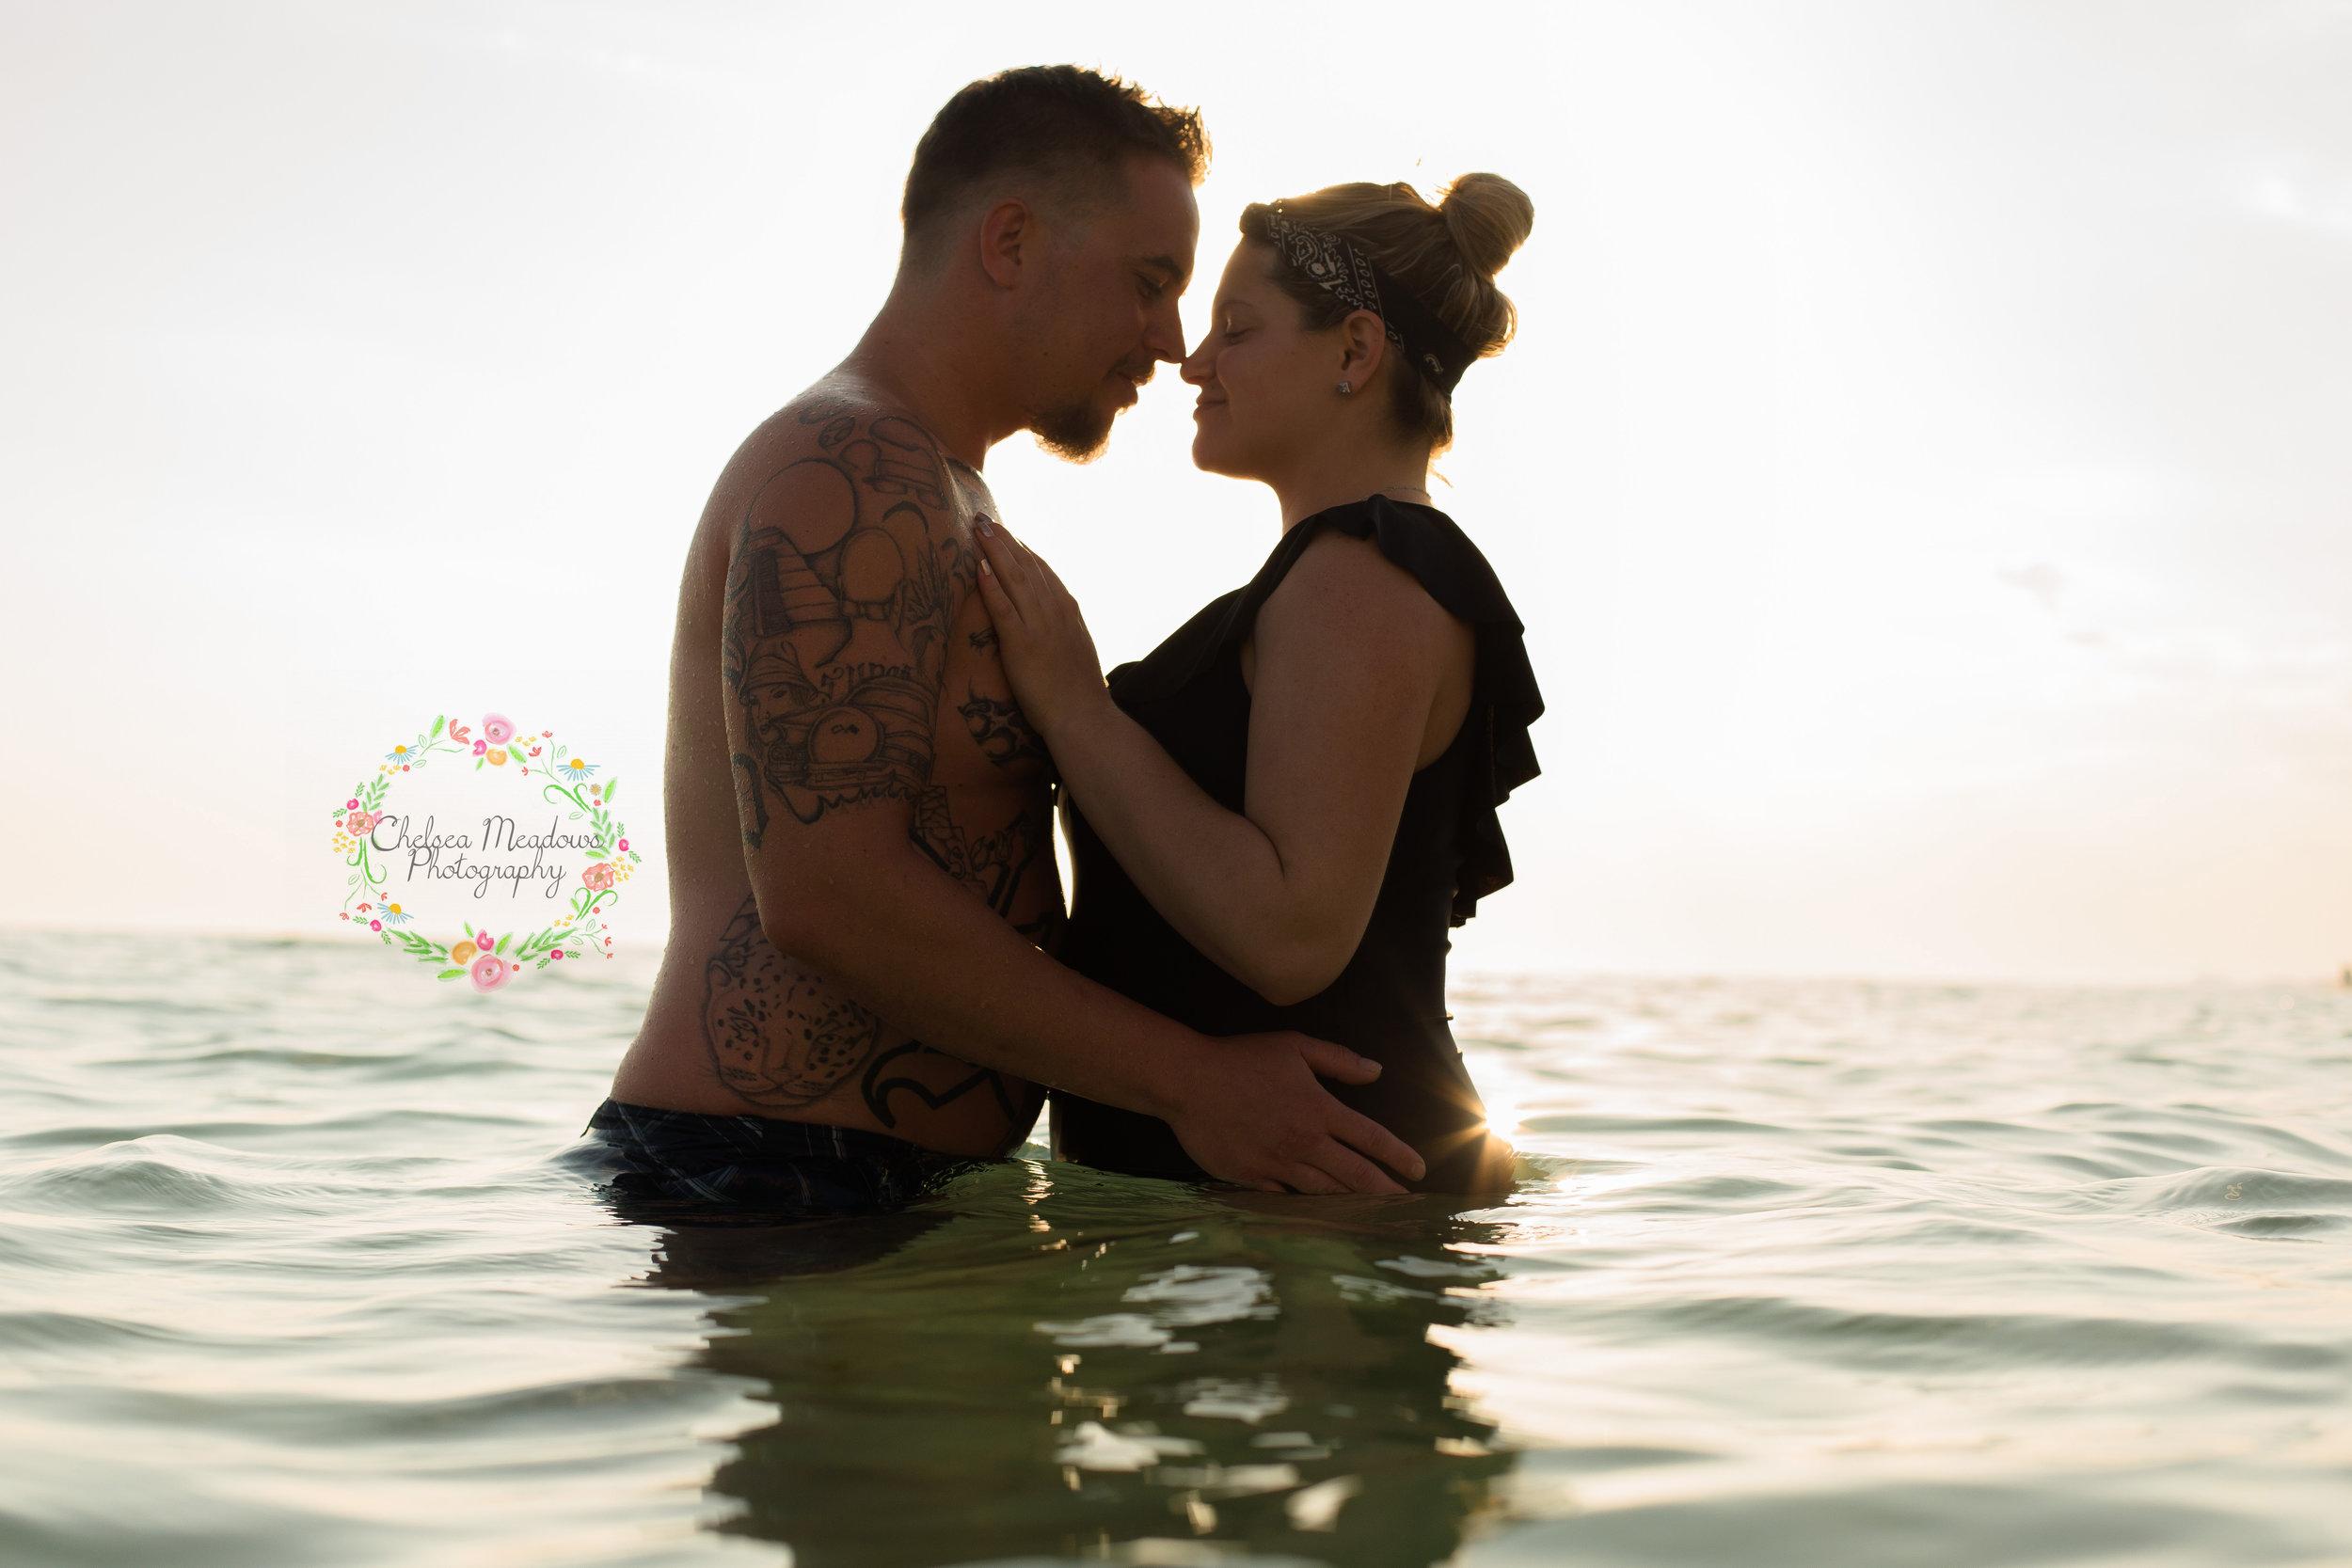 Nicole & Drew Beach Maternity - Nashville Maternity Photography - Chelsea Meadows Photography (201).jpg